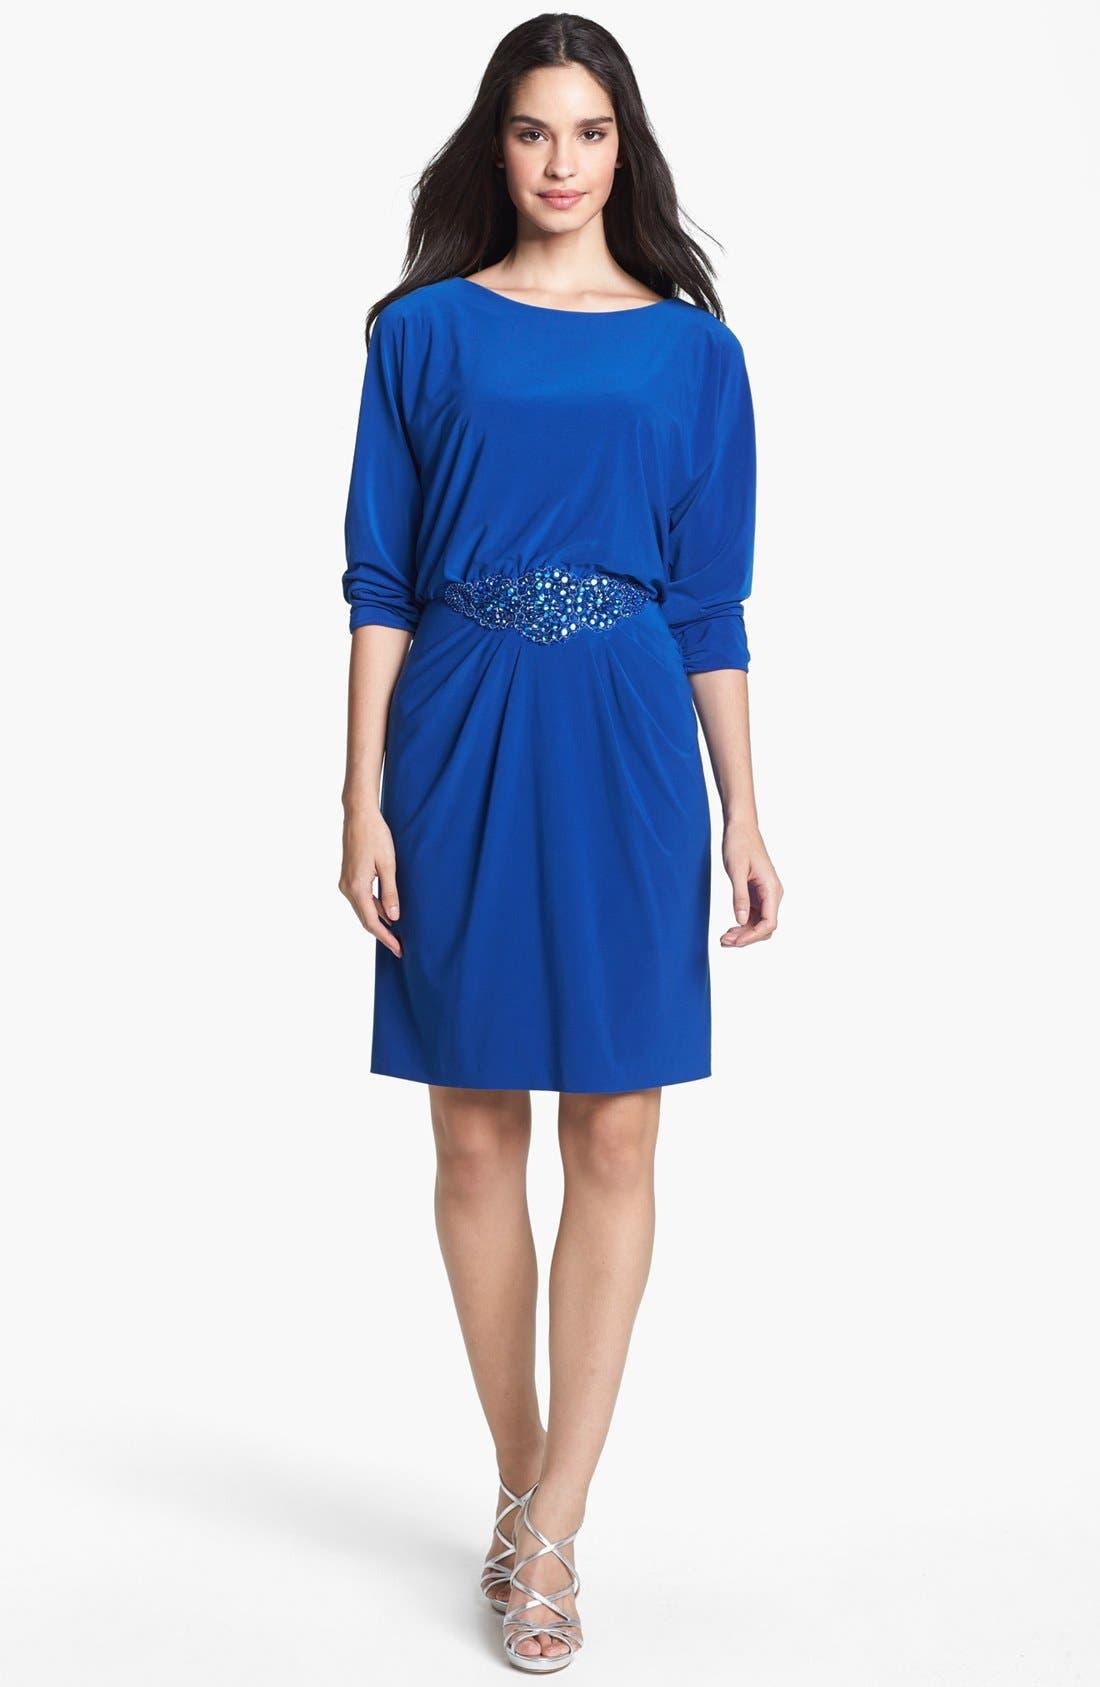 Alternate Image 1 Selected - Alex Evenings Beaded Waist Jersey Blouson Dress